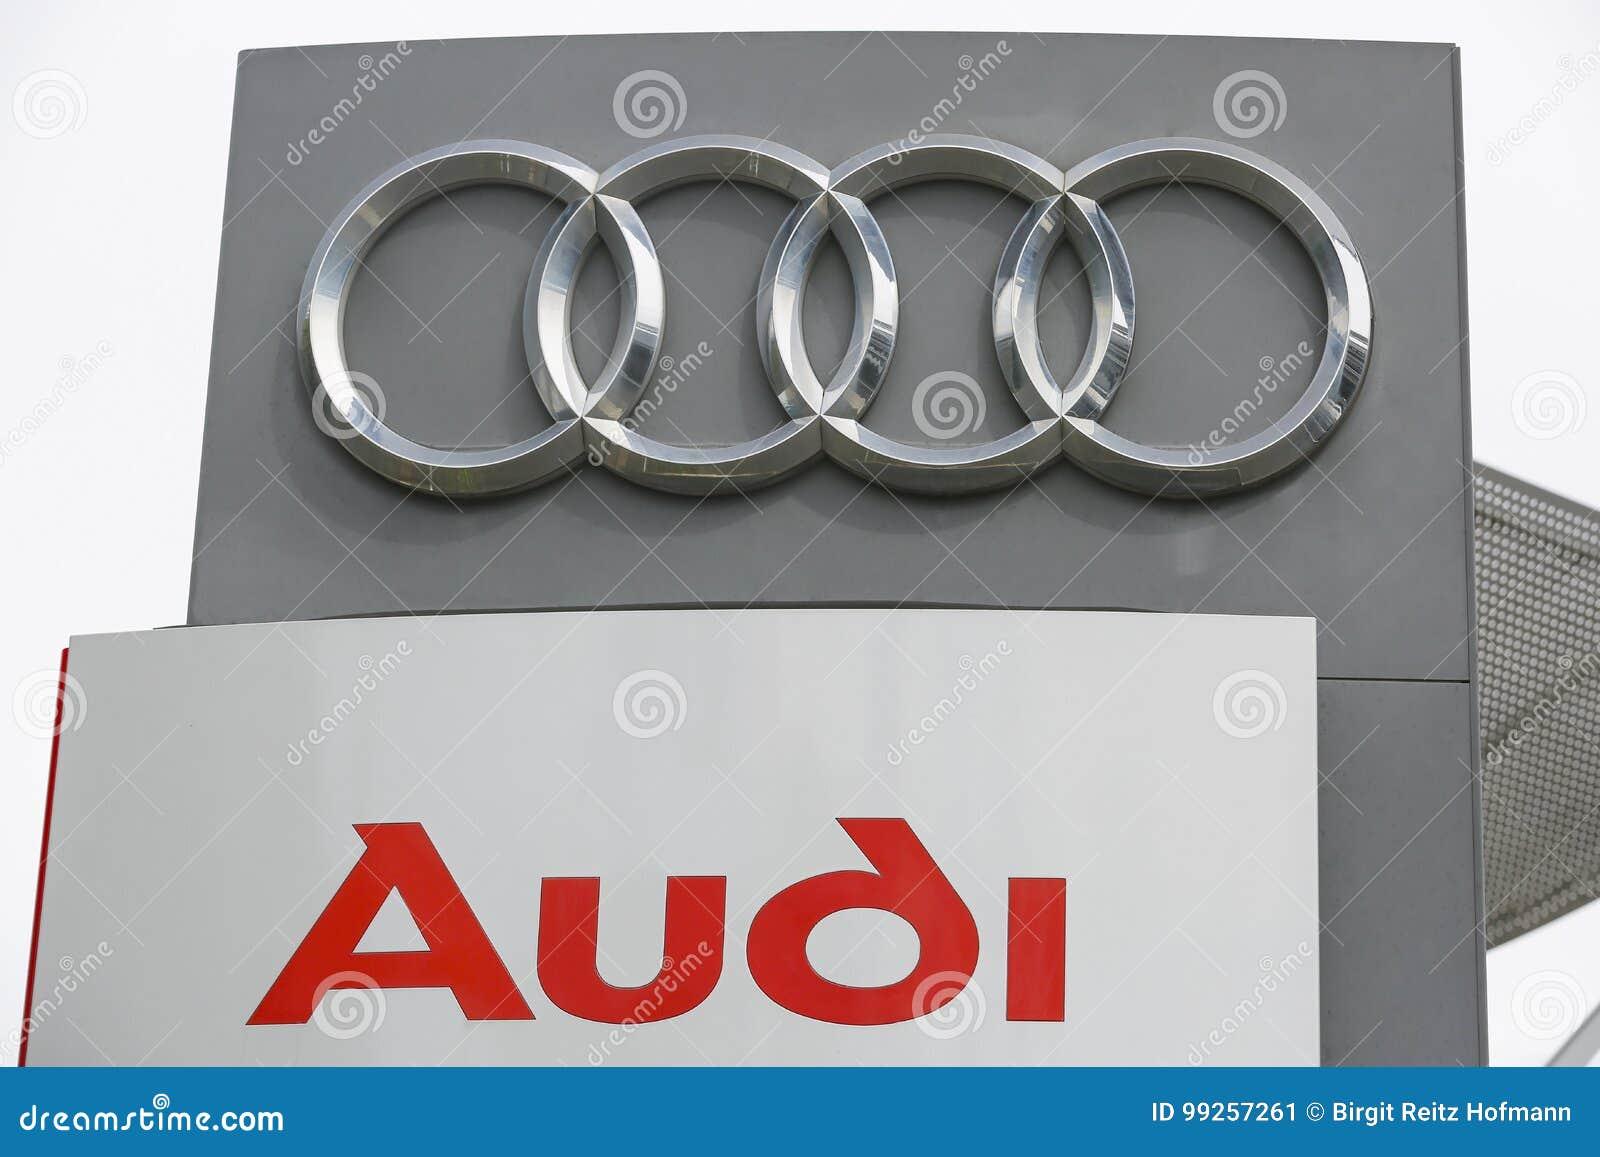 Audi Zeichen Stock Photos - Download 680 Images